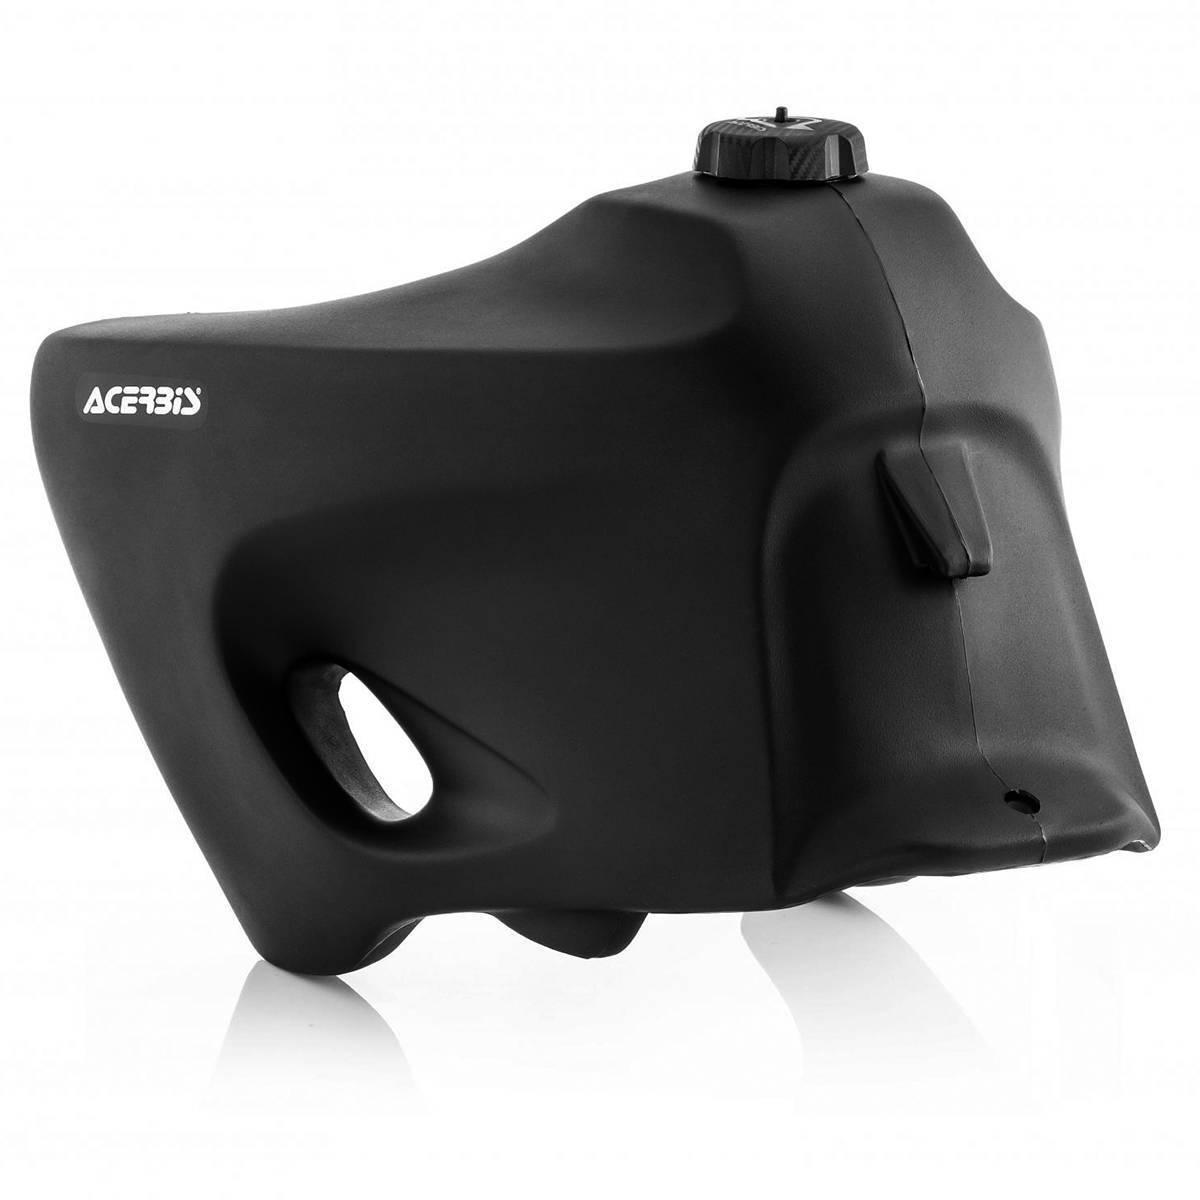 0001599-090 - Deposito Acerbis Yamaha Xt 600 95 03 23 Litros Negro